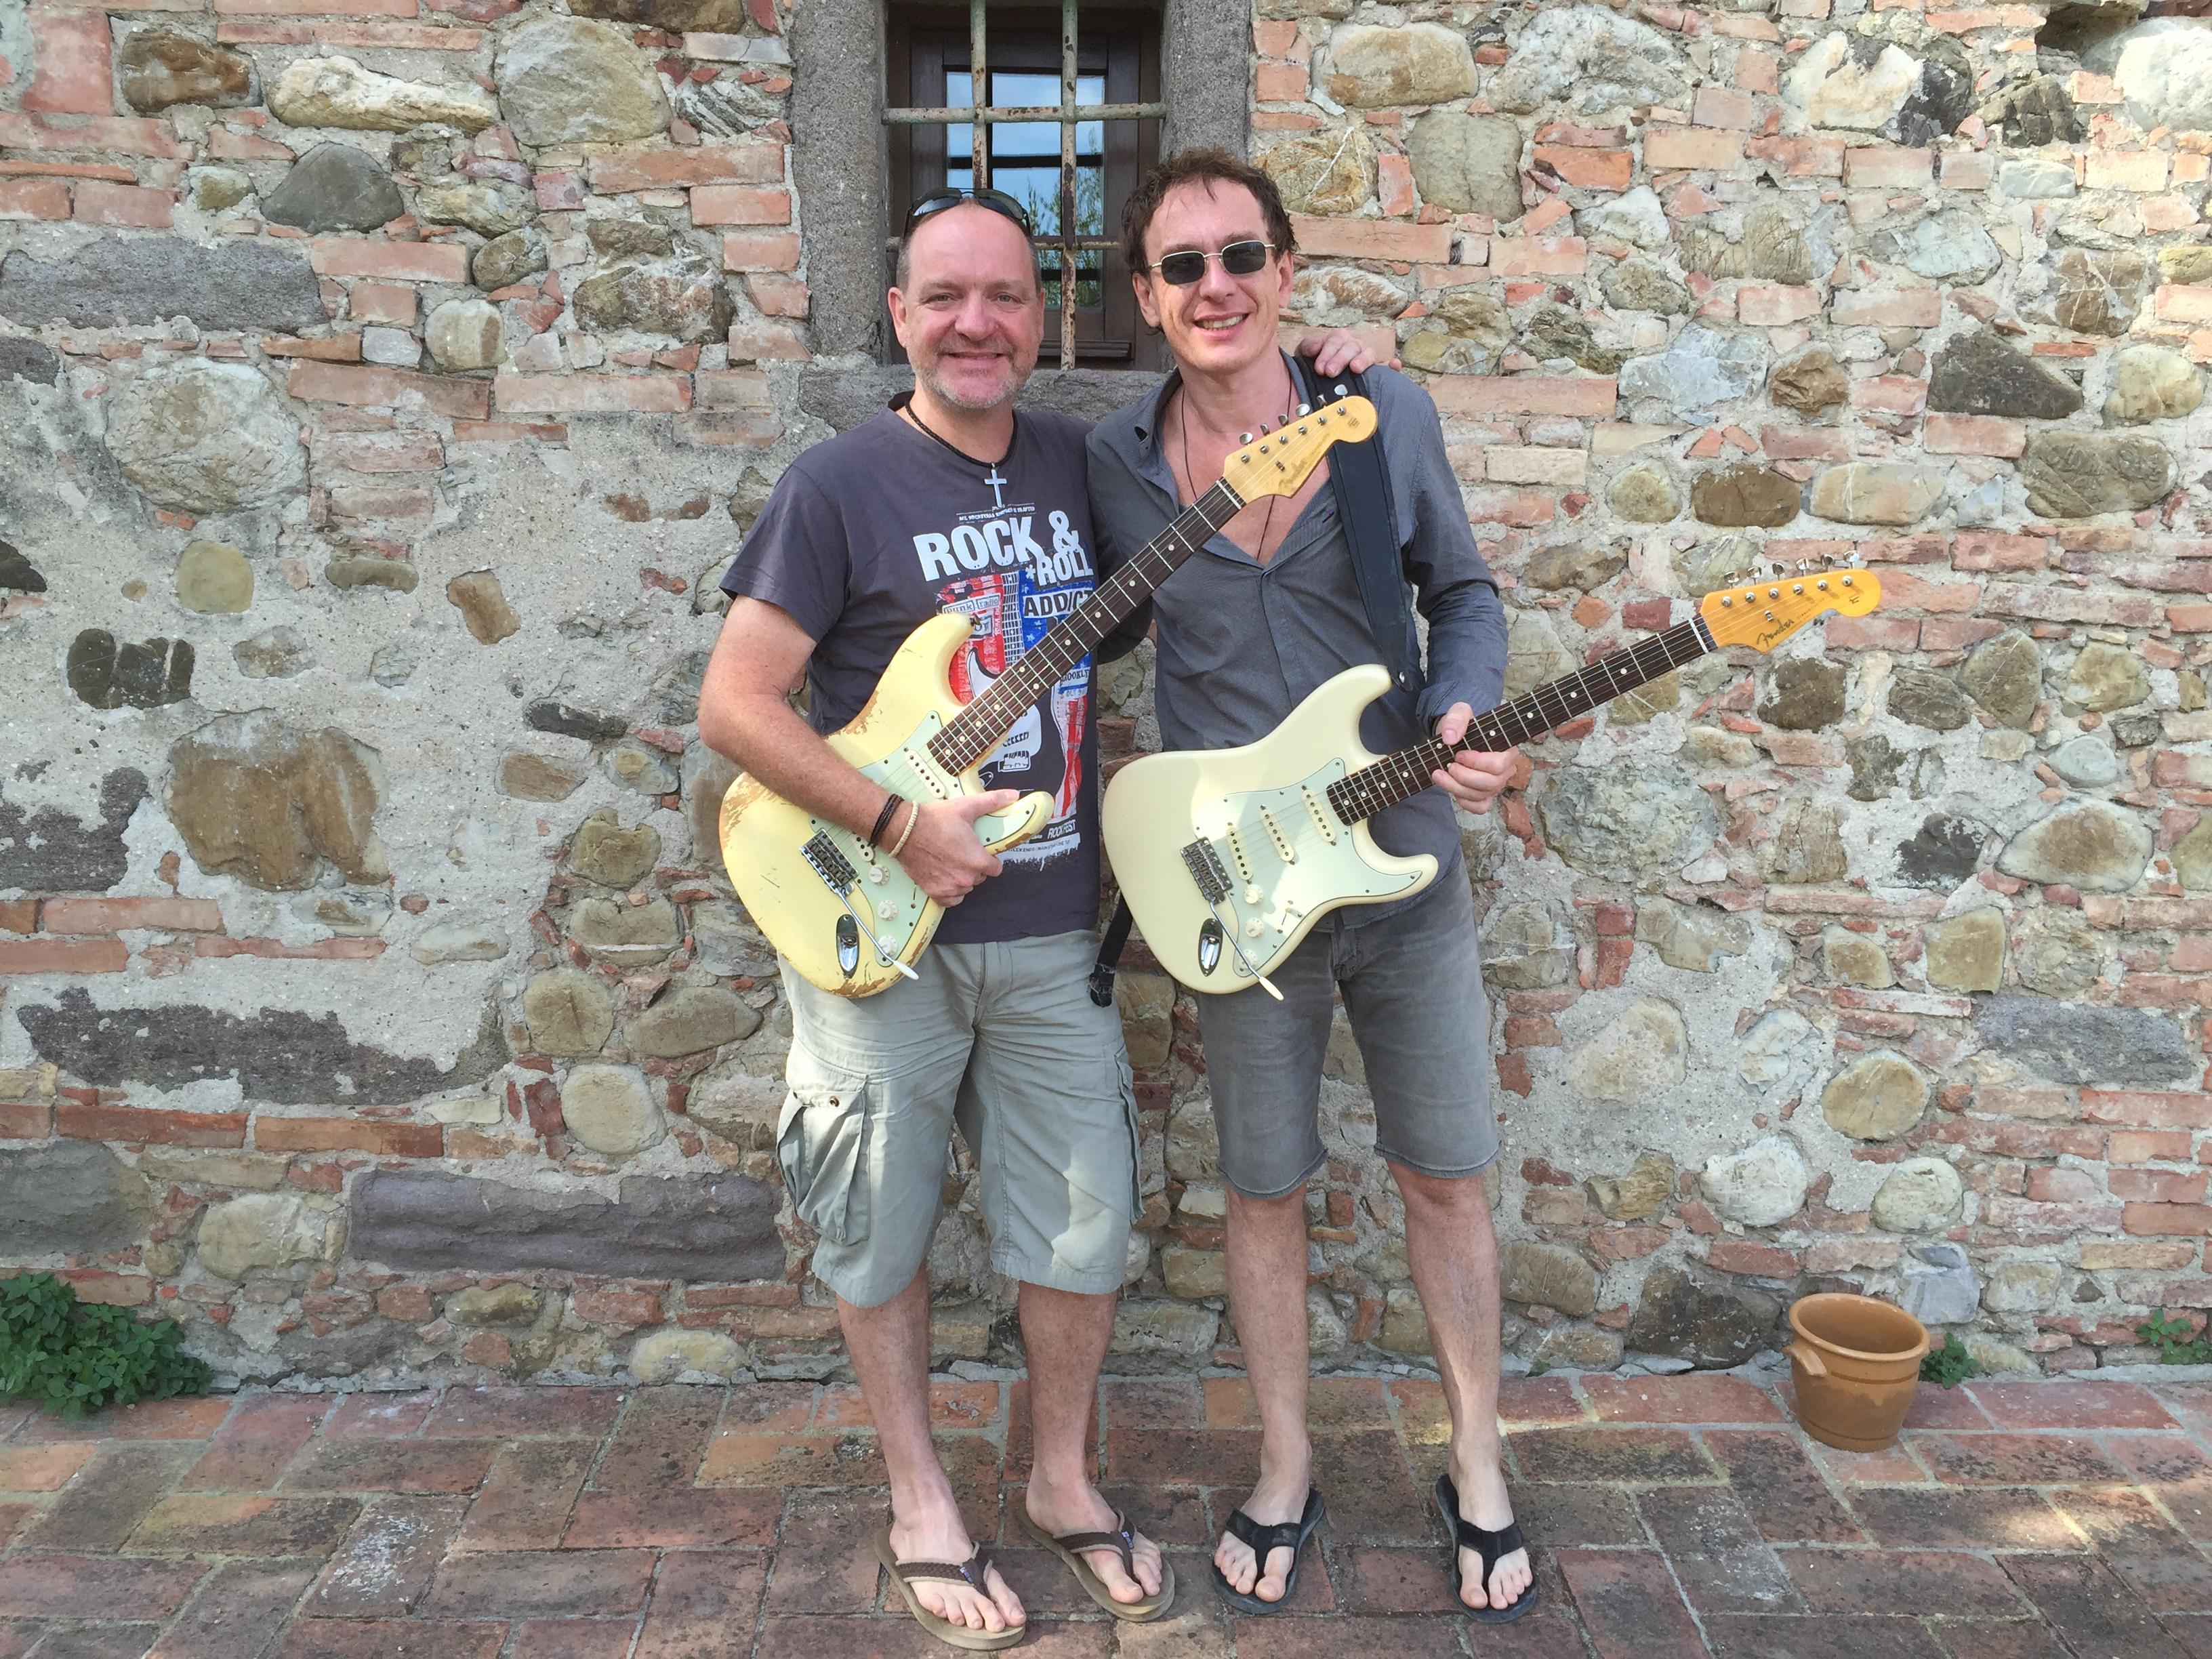 Bobby Stöcker & Marcus Deml